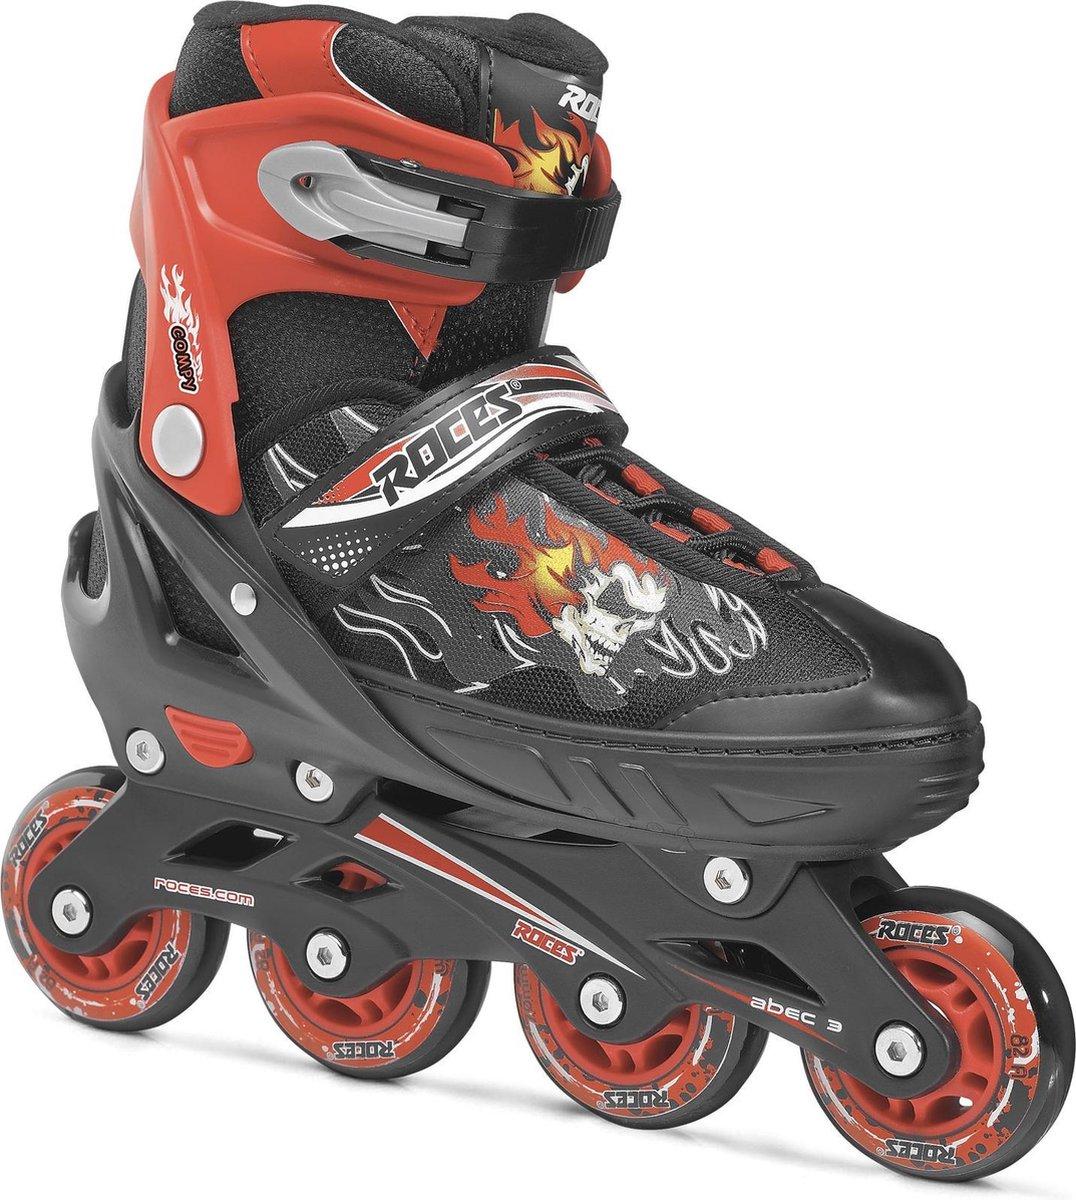 Roces Compy 6.0 skate set Inlineskates - Maat 34-37 - Unisex - zwart/rood